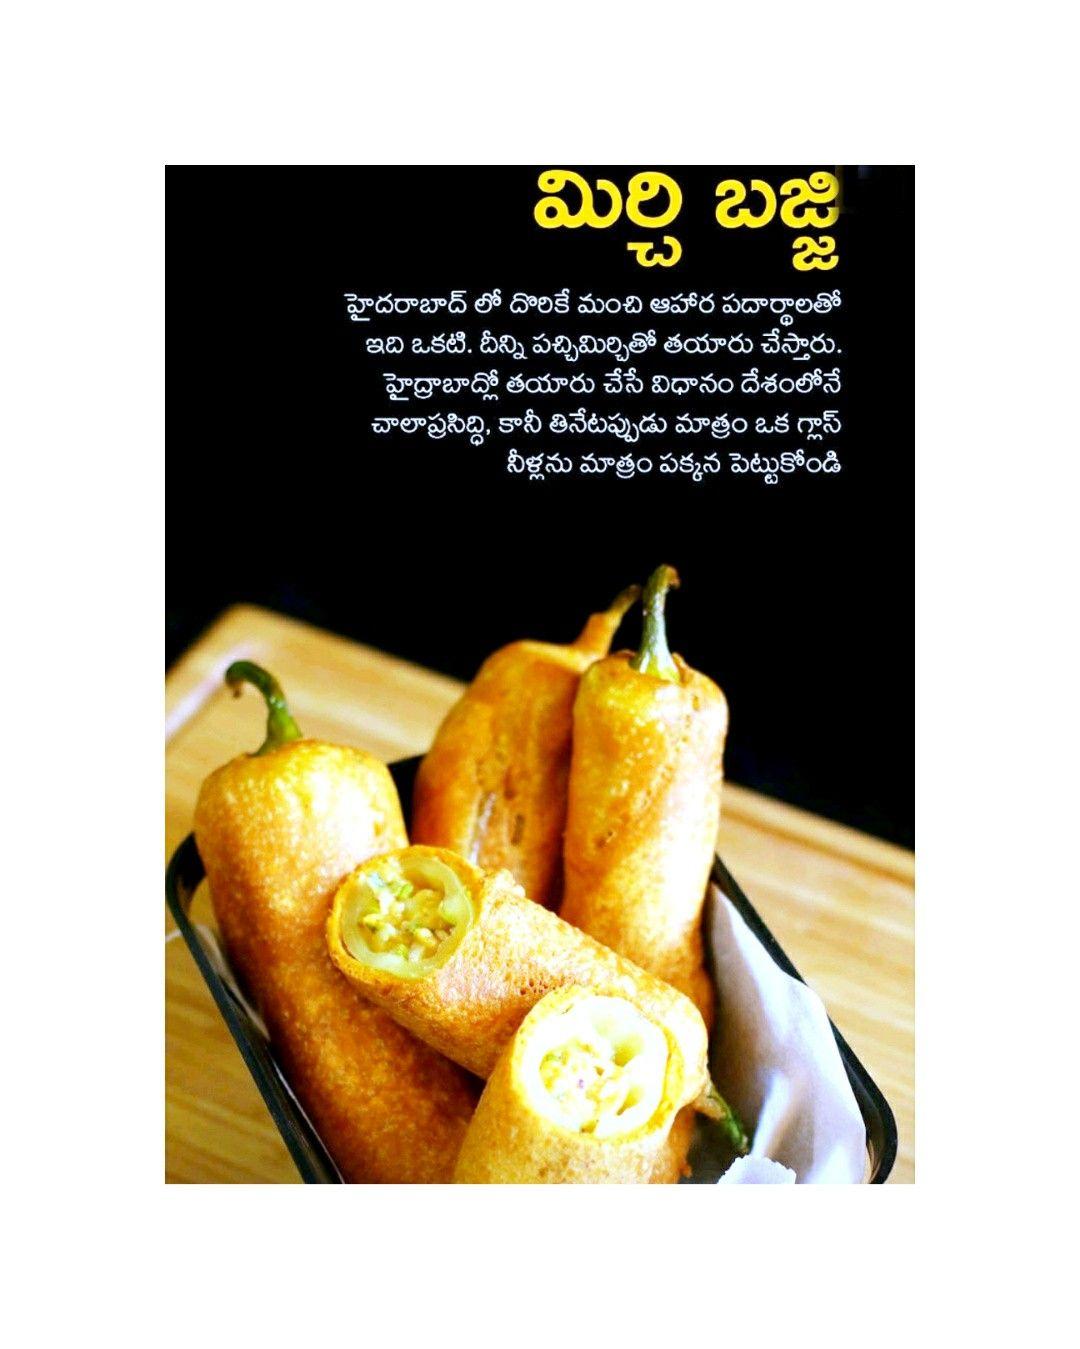 Pin by Vasu, Chittoor on Telugu, Vasu, Chittoor Food